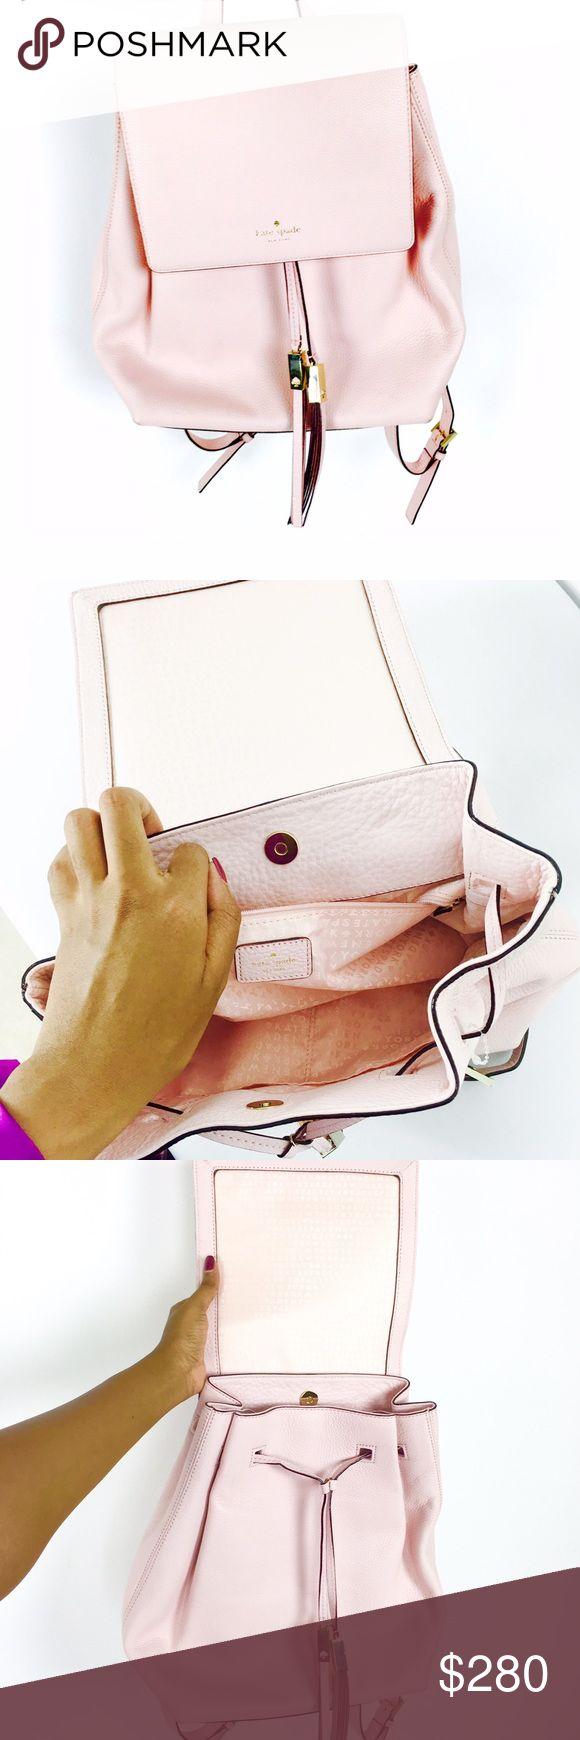 KATE SPADE (New + Rare) pink wilder bag | backpack Feminine posy pale pink and gold backpack by Kate Spade! NWOT, never worn! kate spade Bags Backpacks